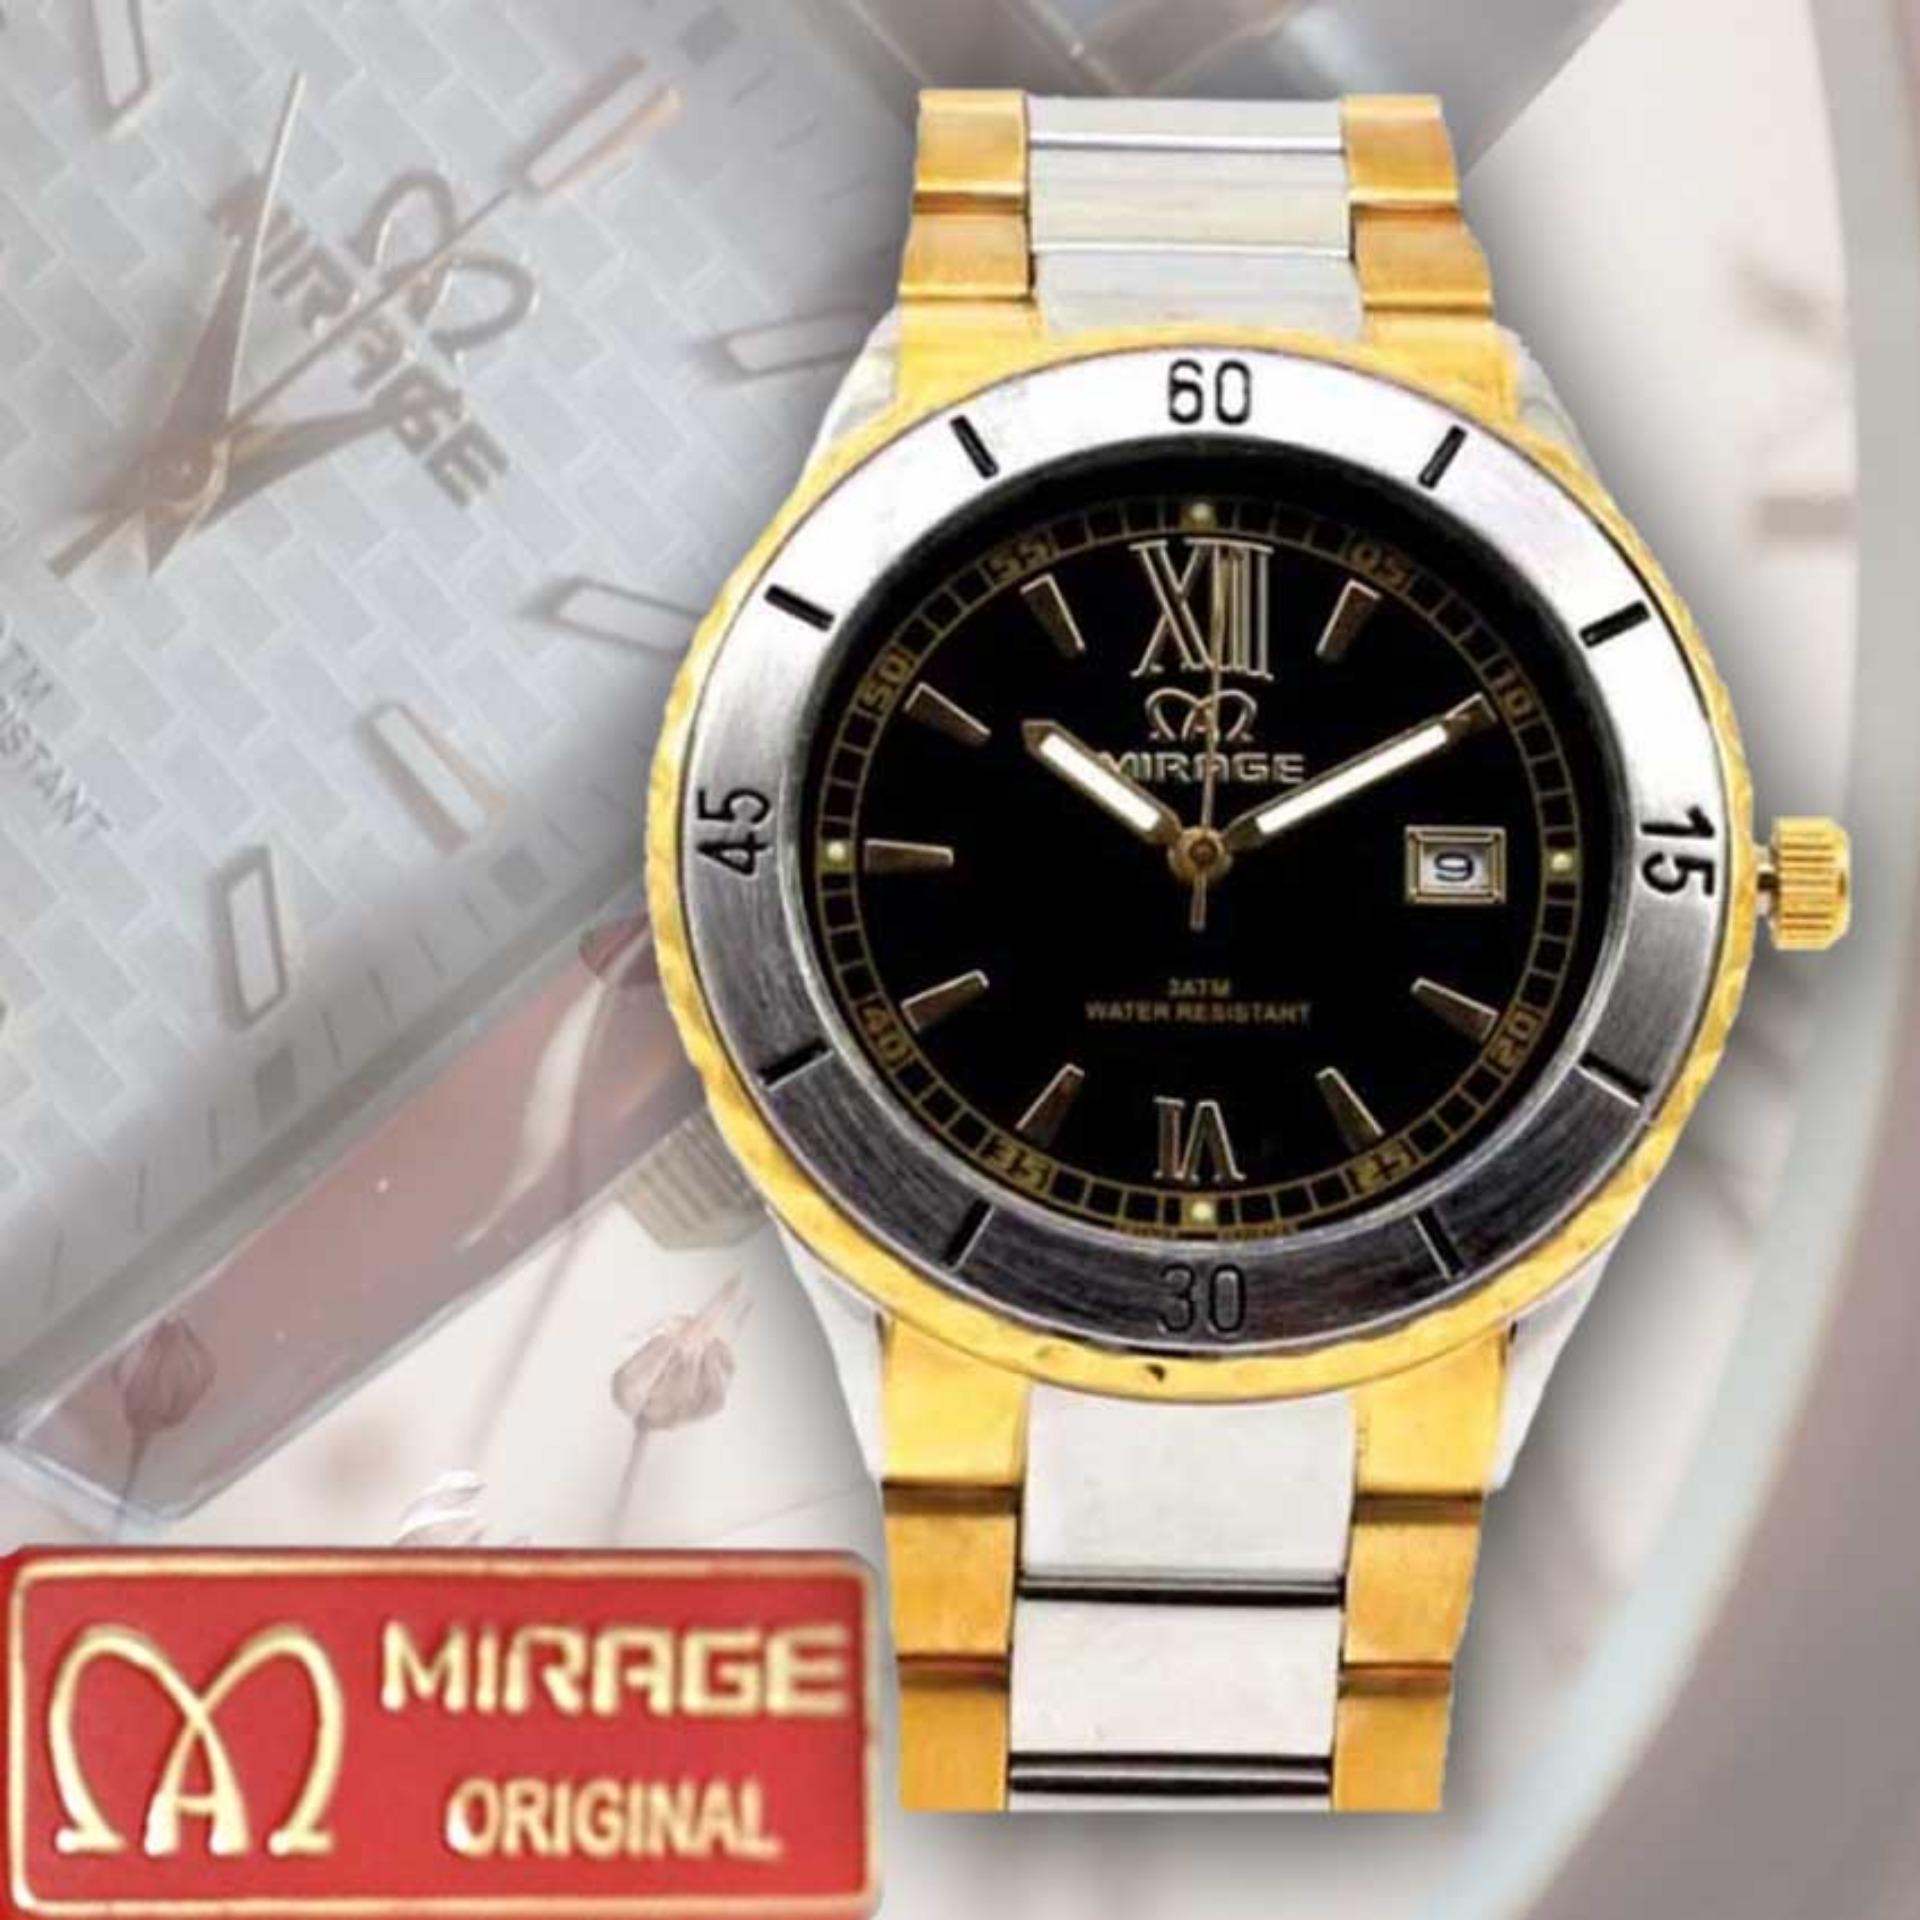 Jam Tangan Pria Original Mrg 7411 Brp M Hra Mirage Original Arloji Japan Technology 8187 Brp